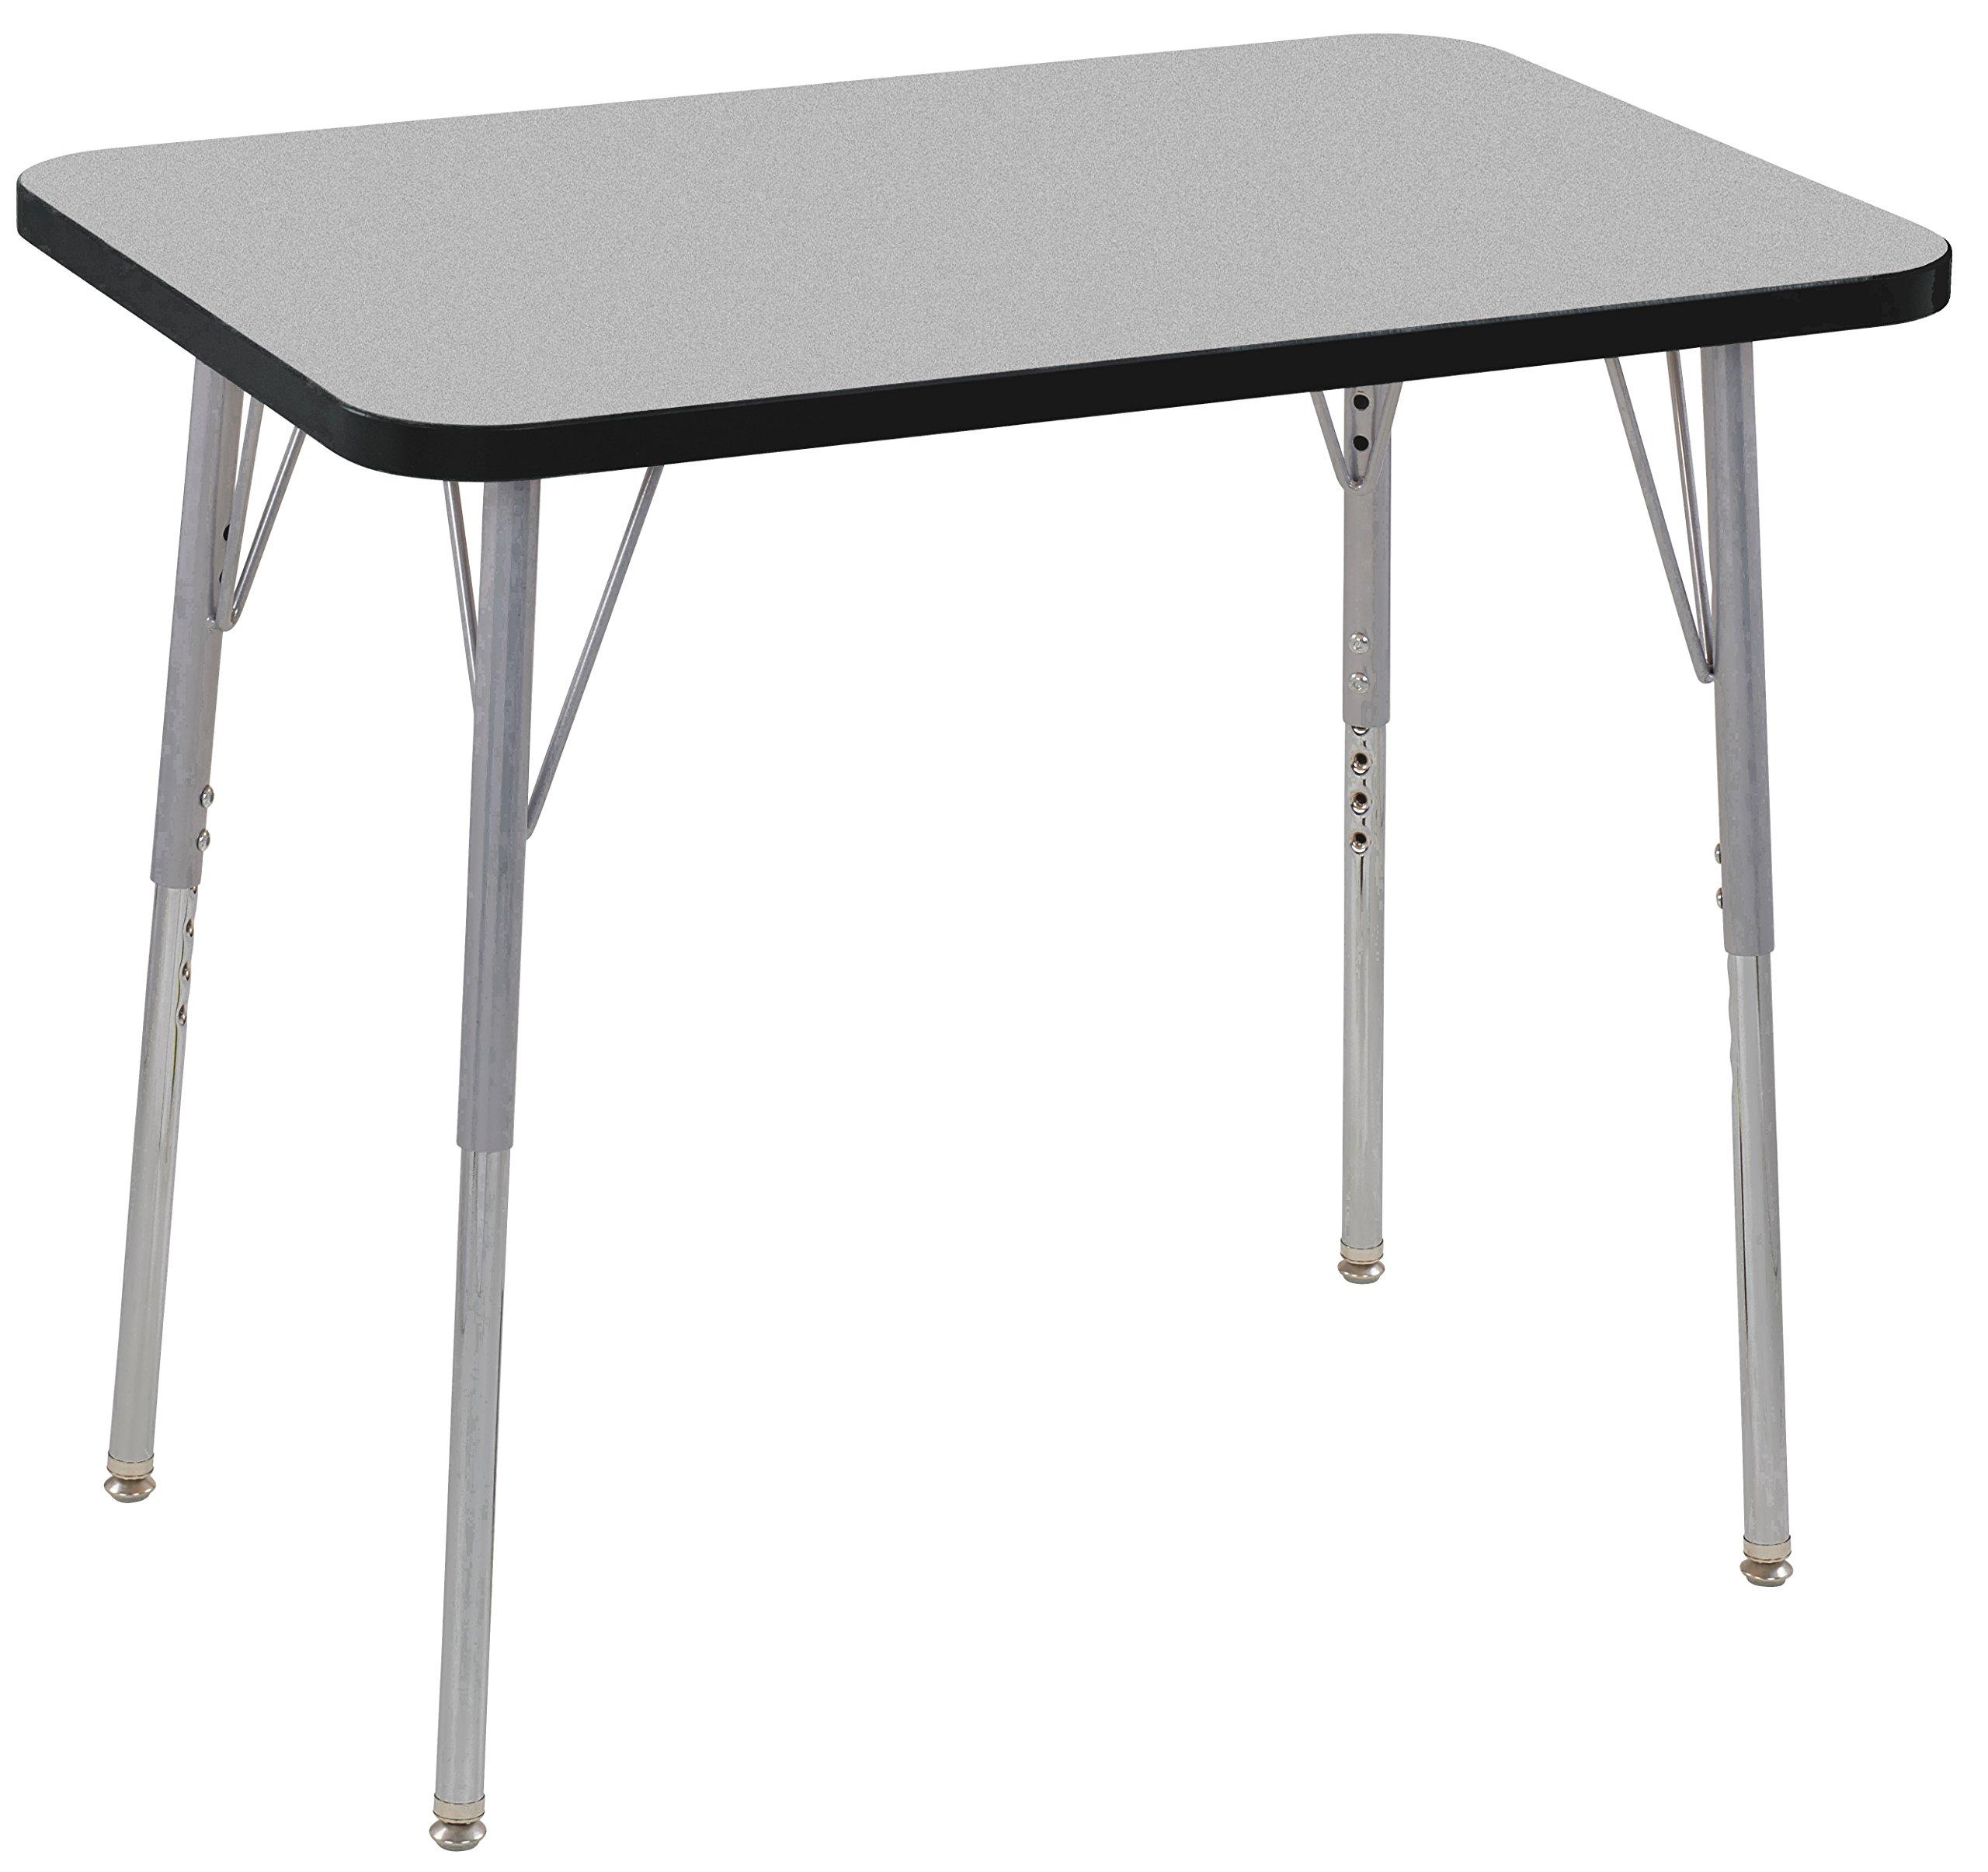 ECR4Kids Contour 24'' x 36'' Rectangle Activity School Table, Standard Legs w/ Swivel Glides, Adjustable Height 19-30 inch (Grey/Black)